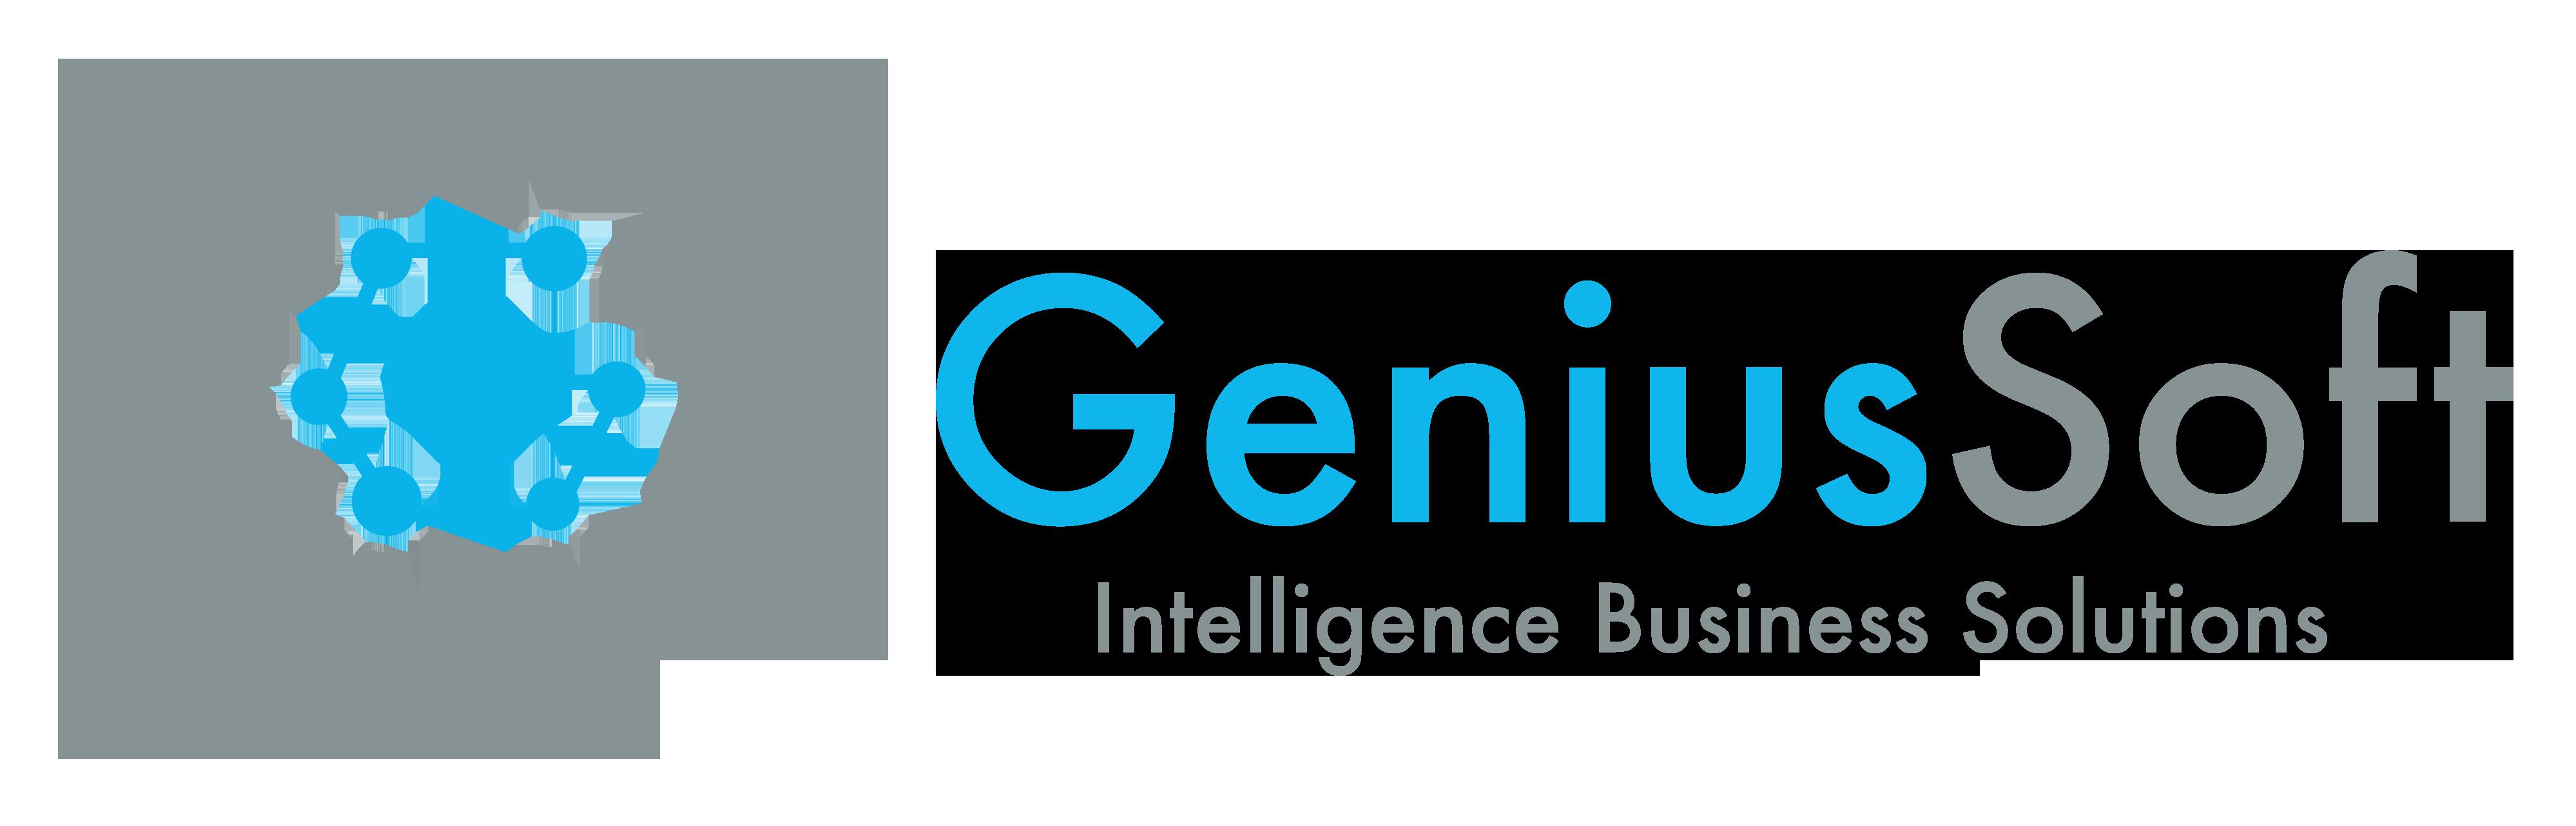 Geniussoft